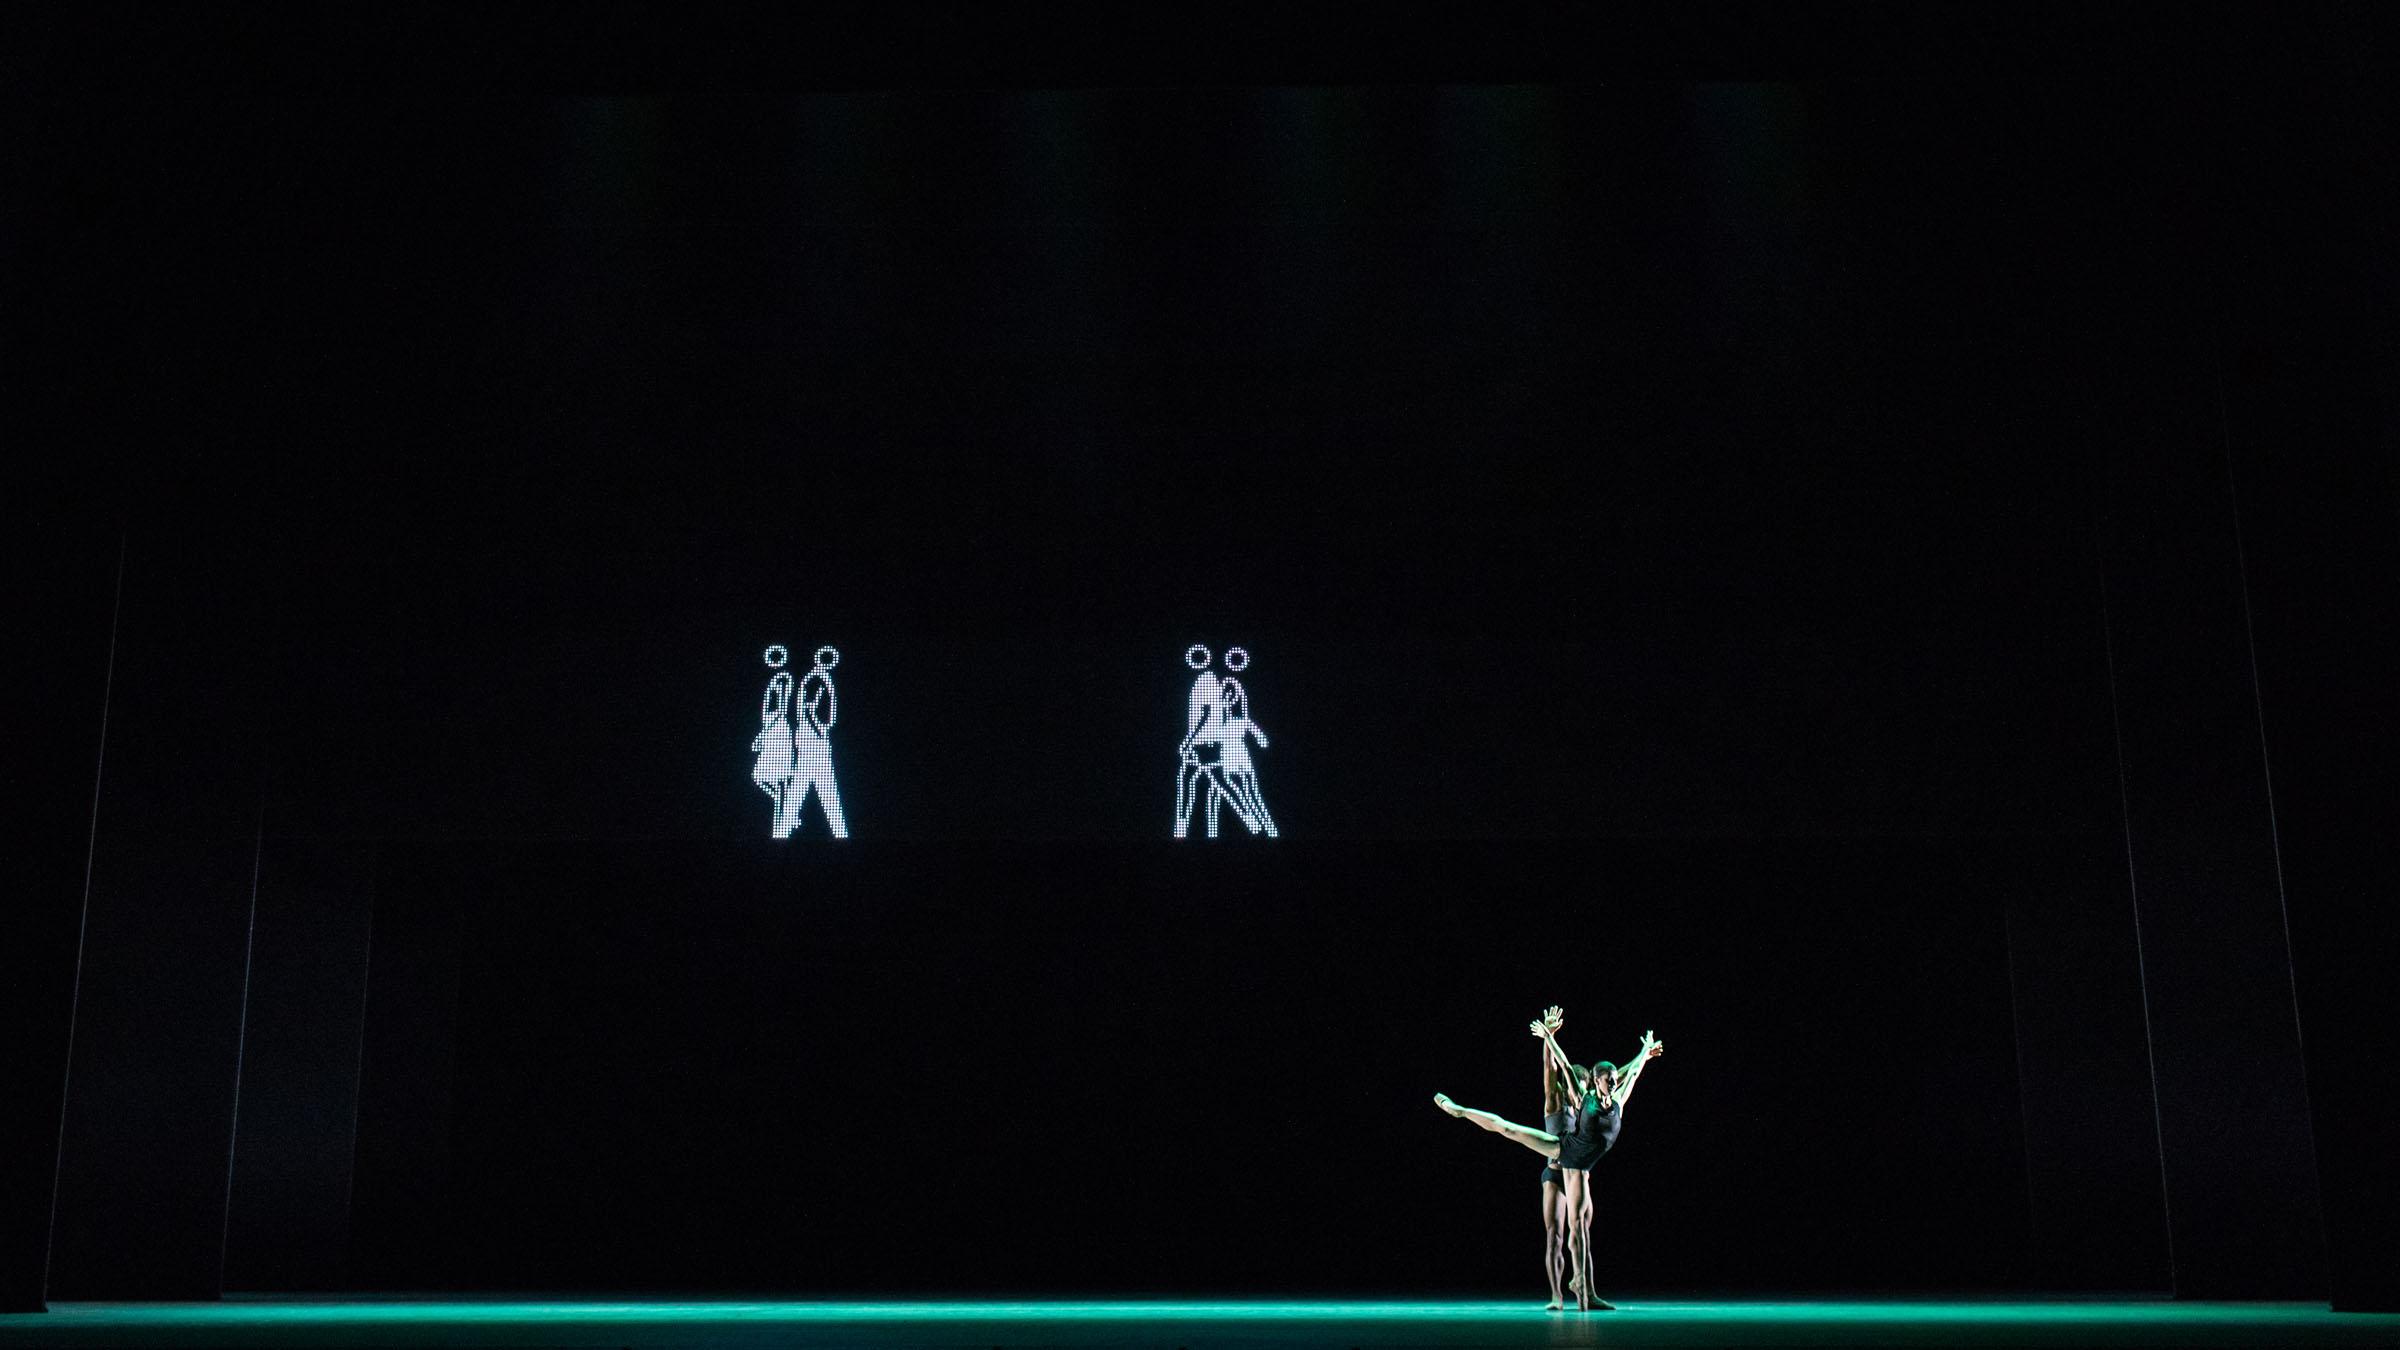 Mayara Magri and Marcelino Sambé in Infra with Julian Opie's artwork